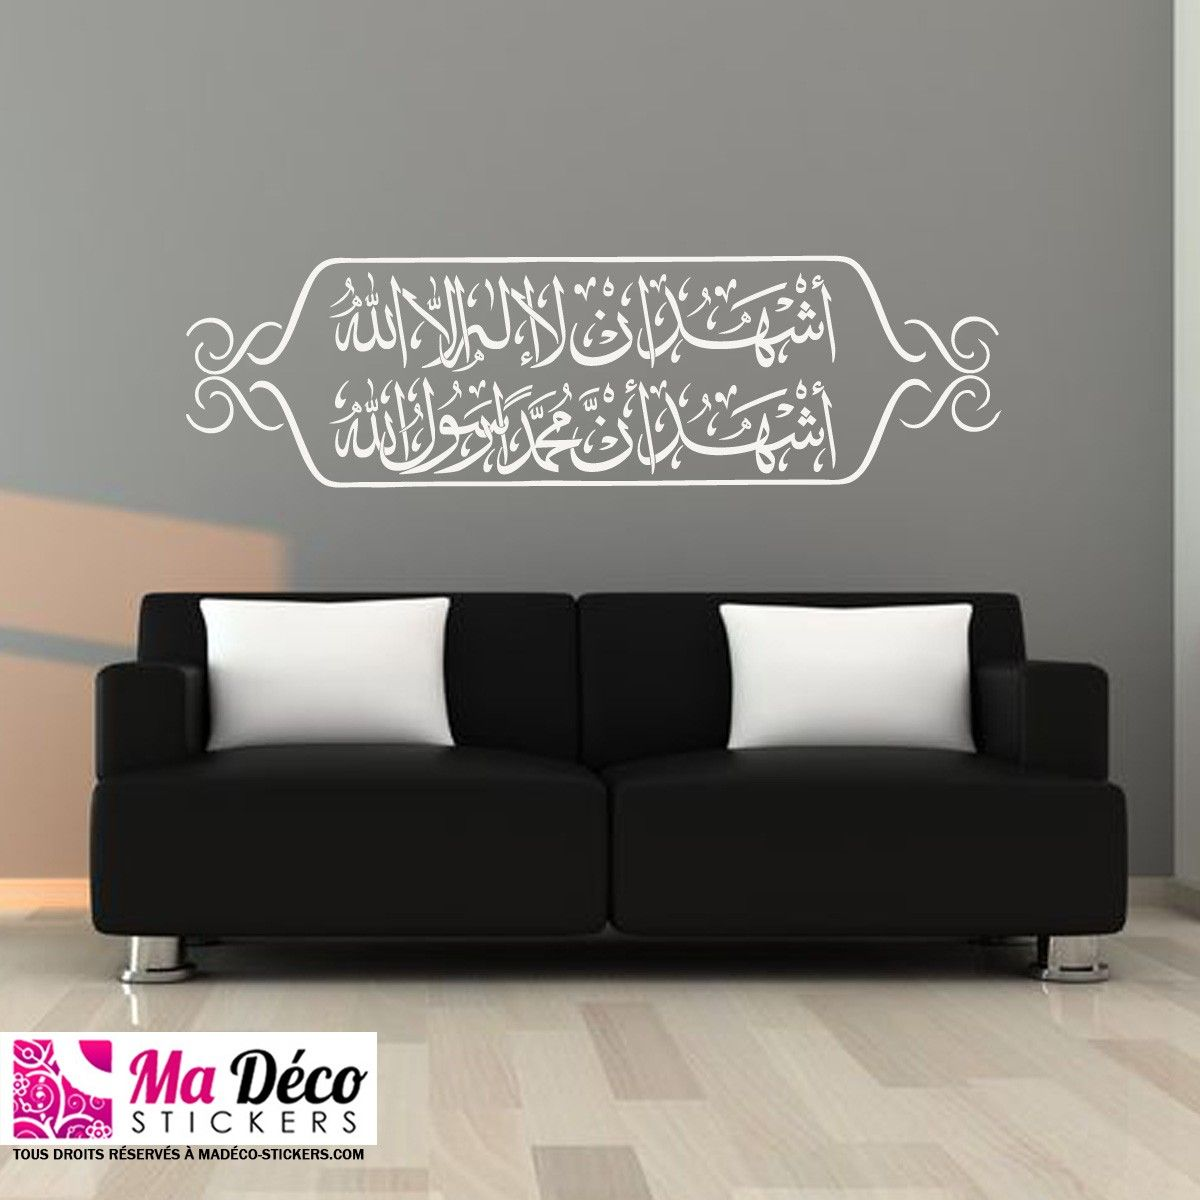 Pin by MsJ Amano on ☪️Islamic Decor☪ | Pinterest | Islamic ...